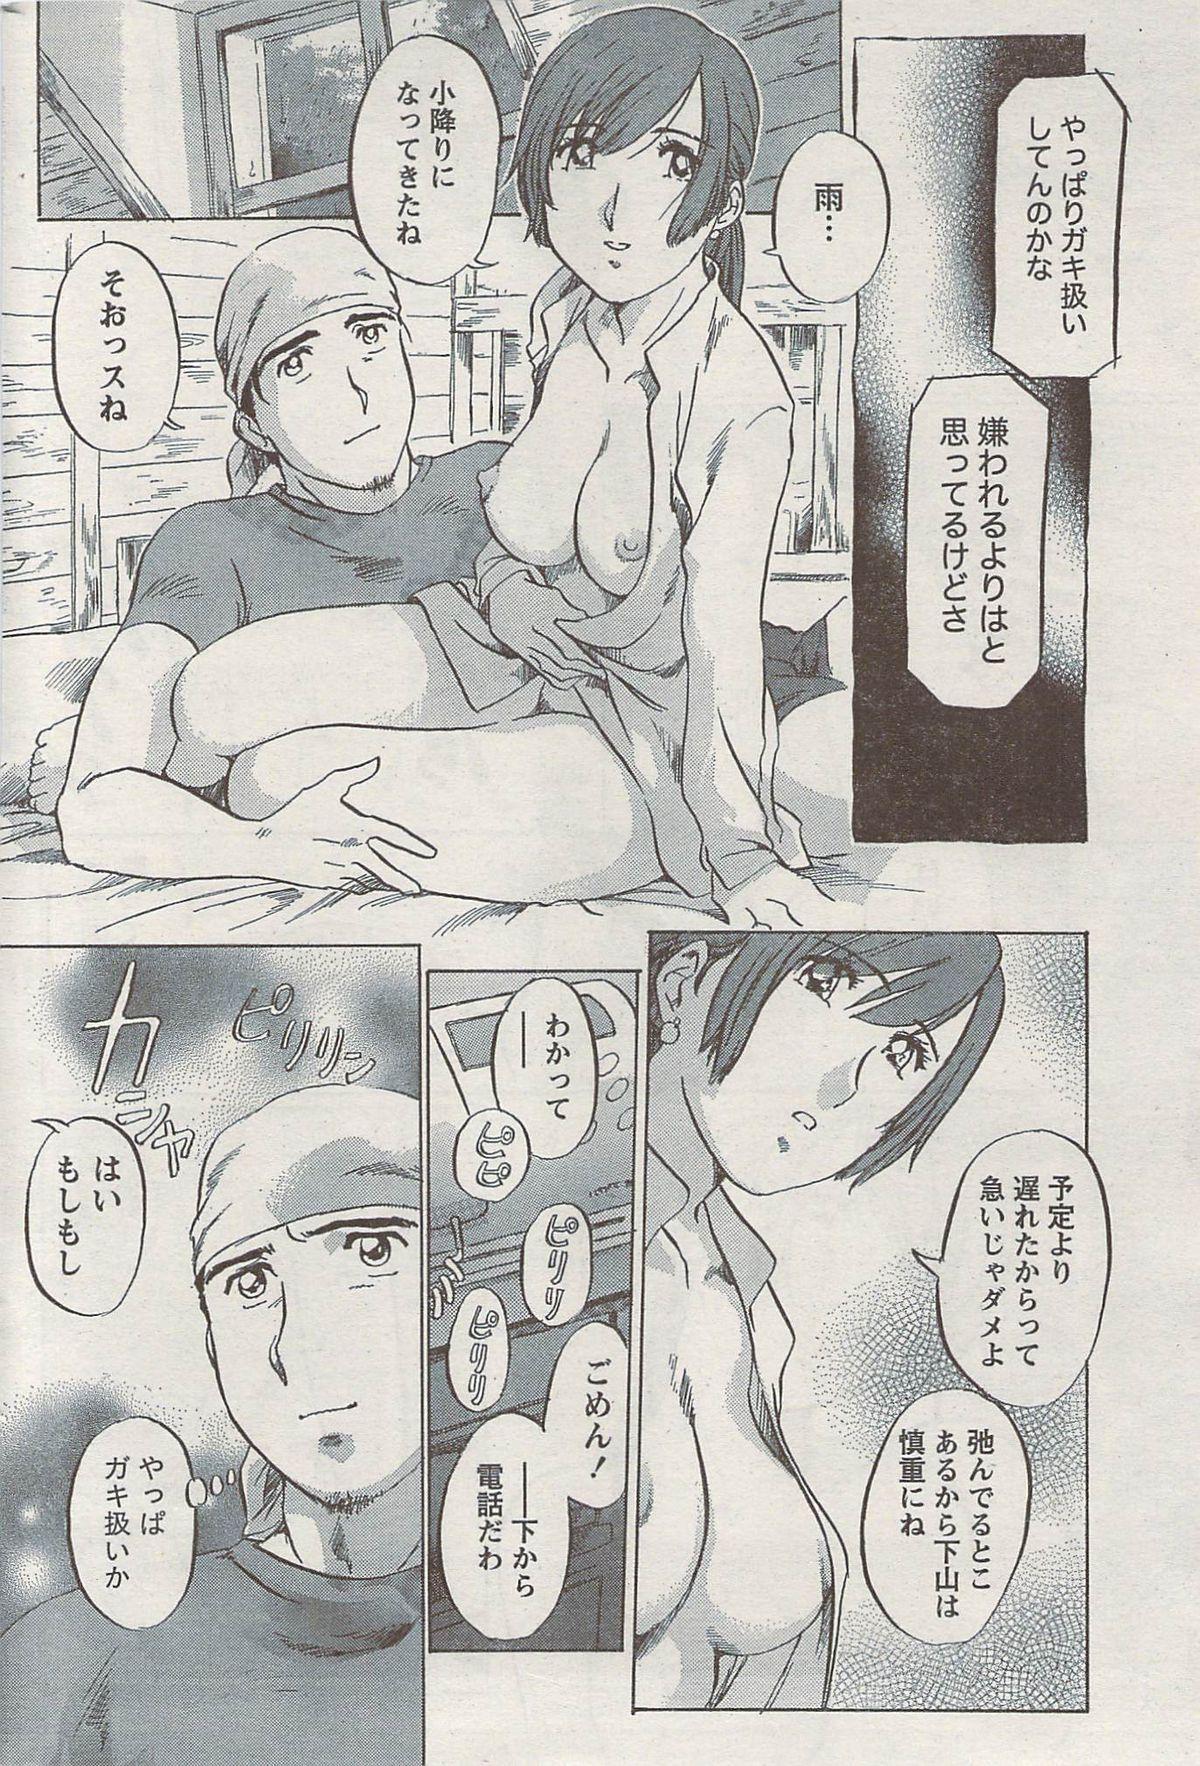 Monthly Vitaman 2007-08 221